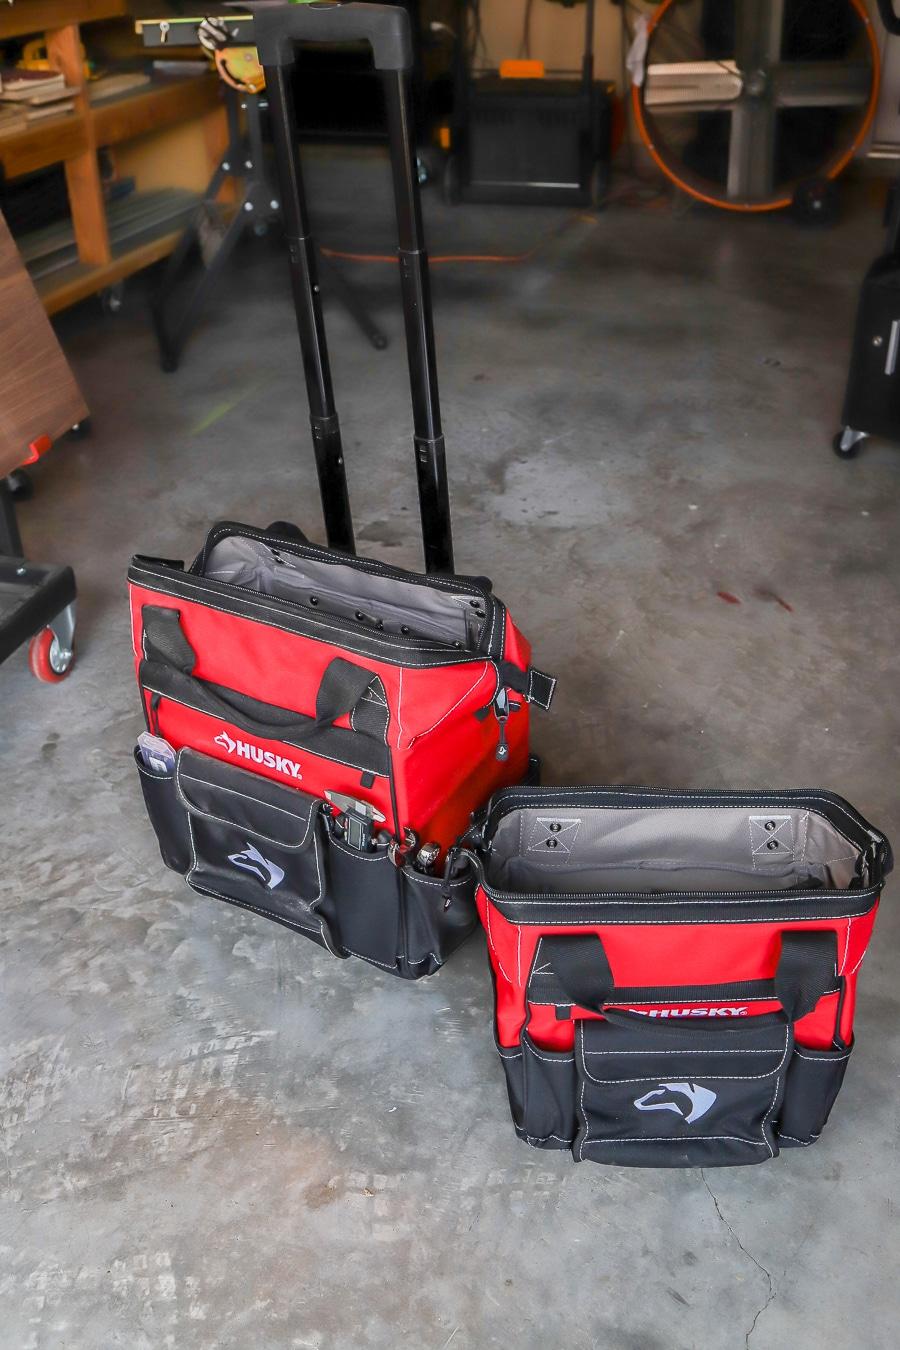 Tool review of Husky rolling tool bag